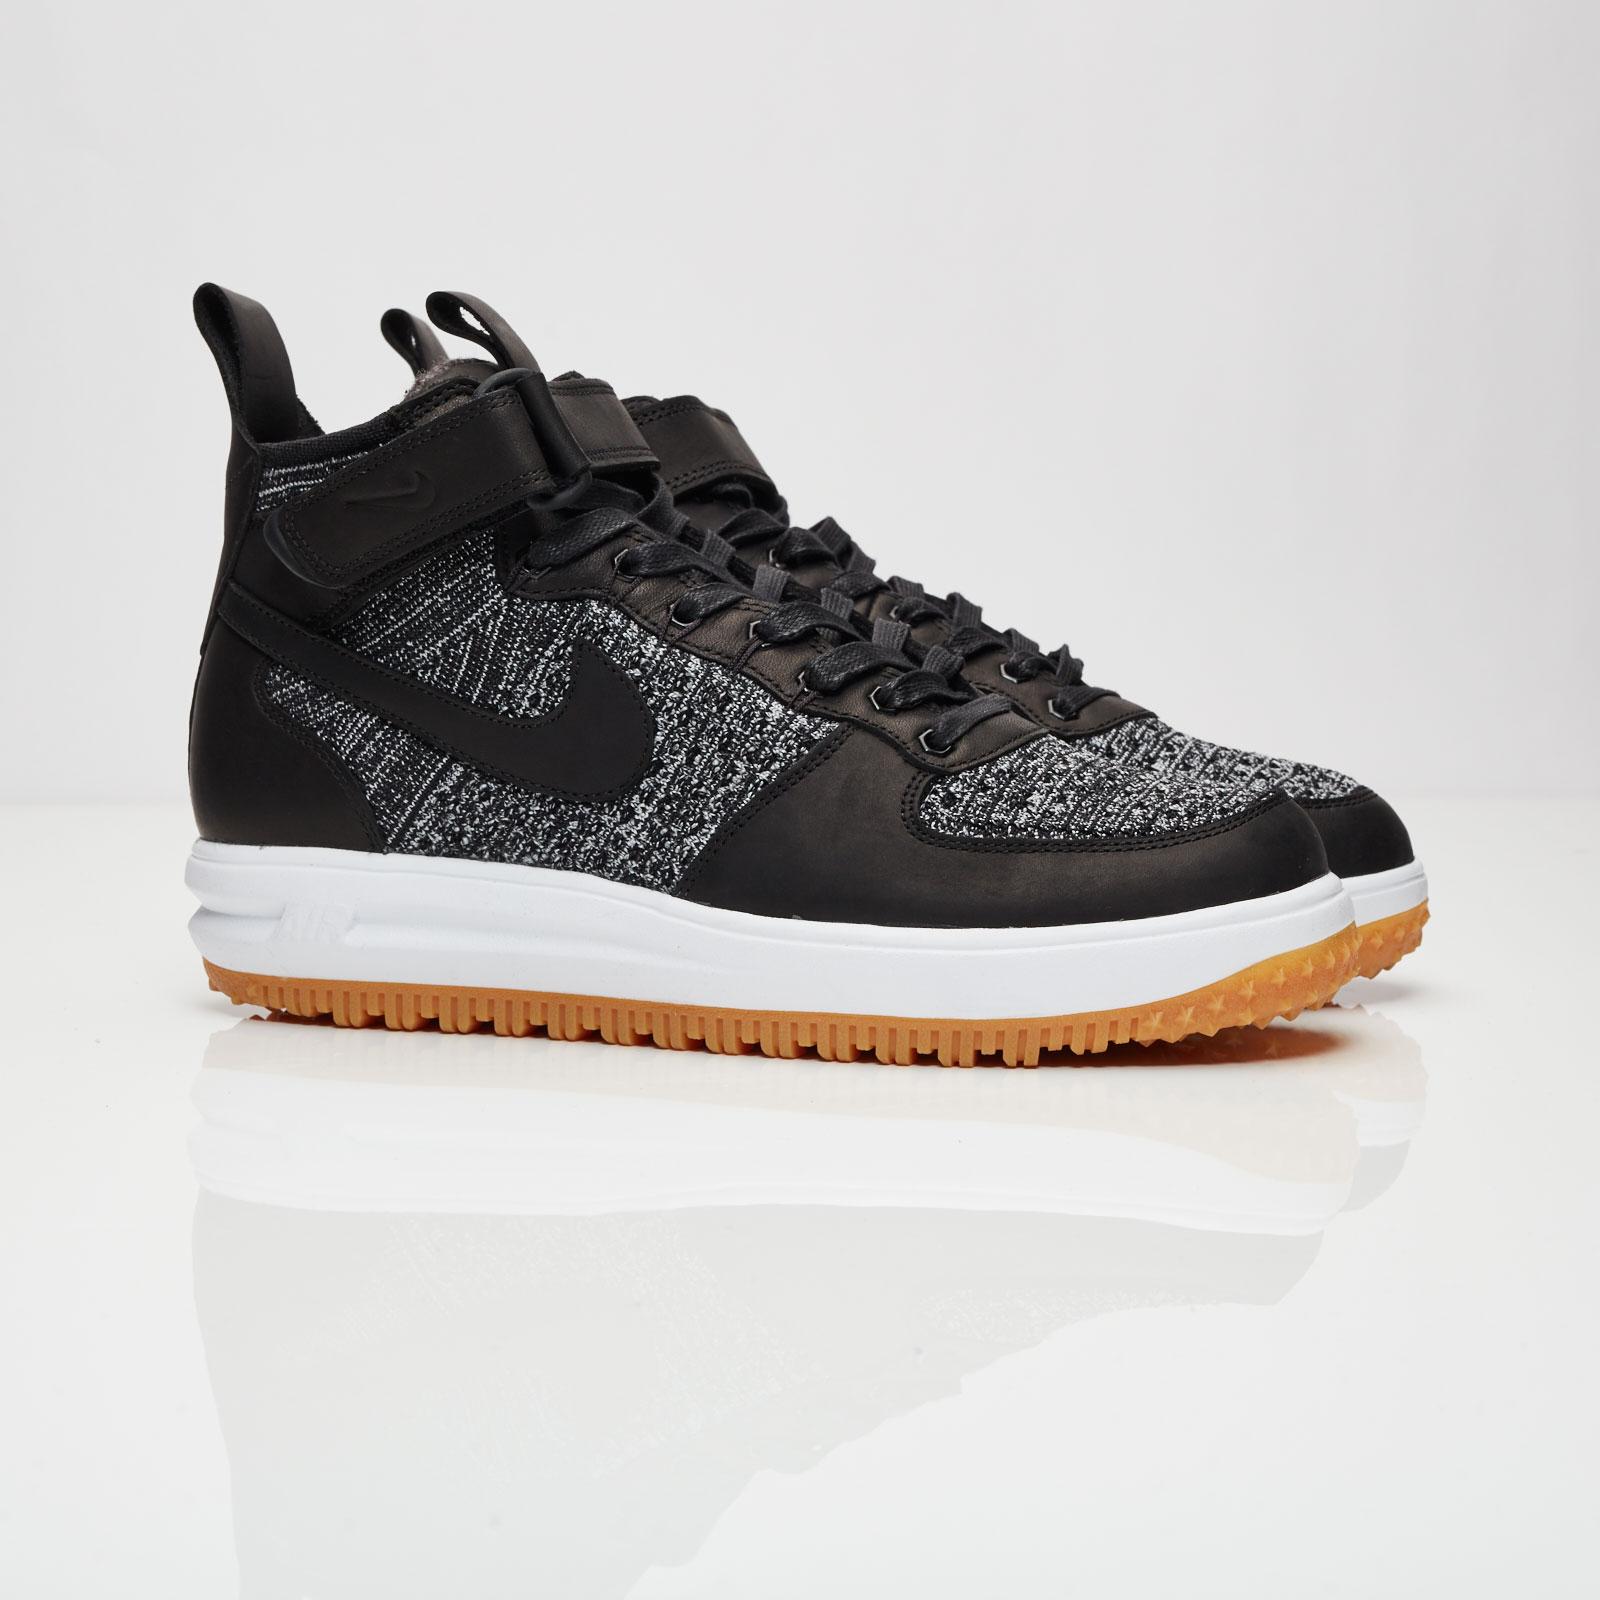 c4786552b22eb5 free shipping flyknit lunar 1 sneakers online e4f4b 46d7b